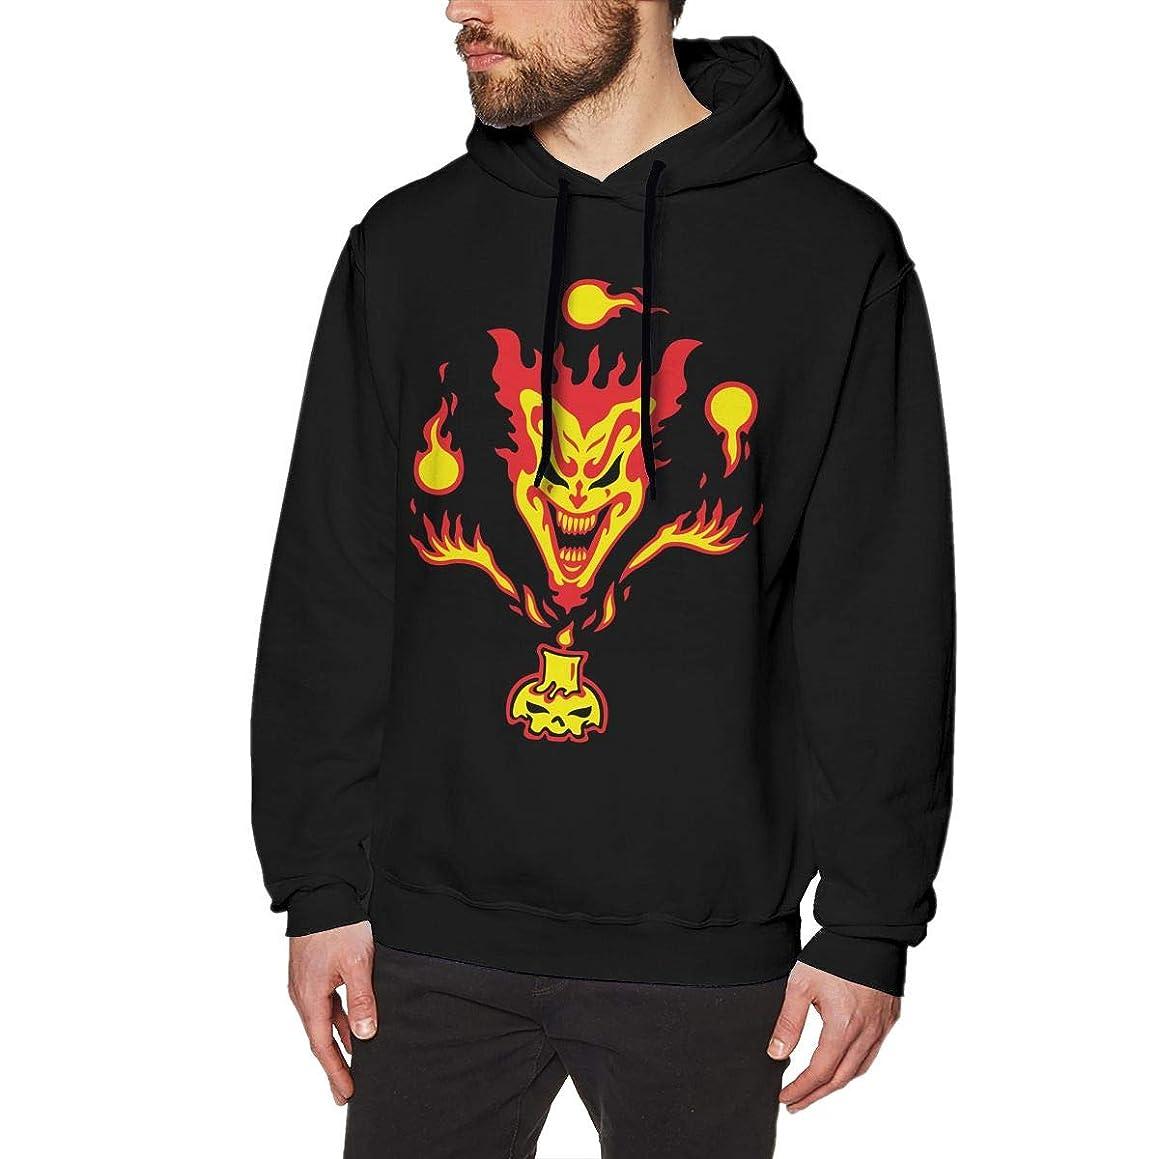 LIALUER Hatchetman ICP Men's Pullover Hooded Sweatshirt